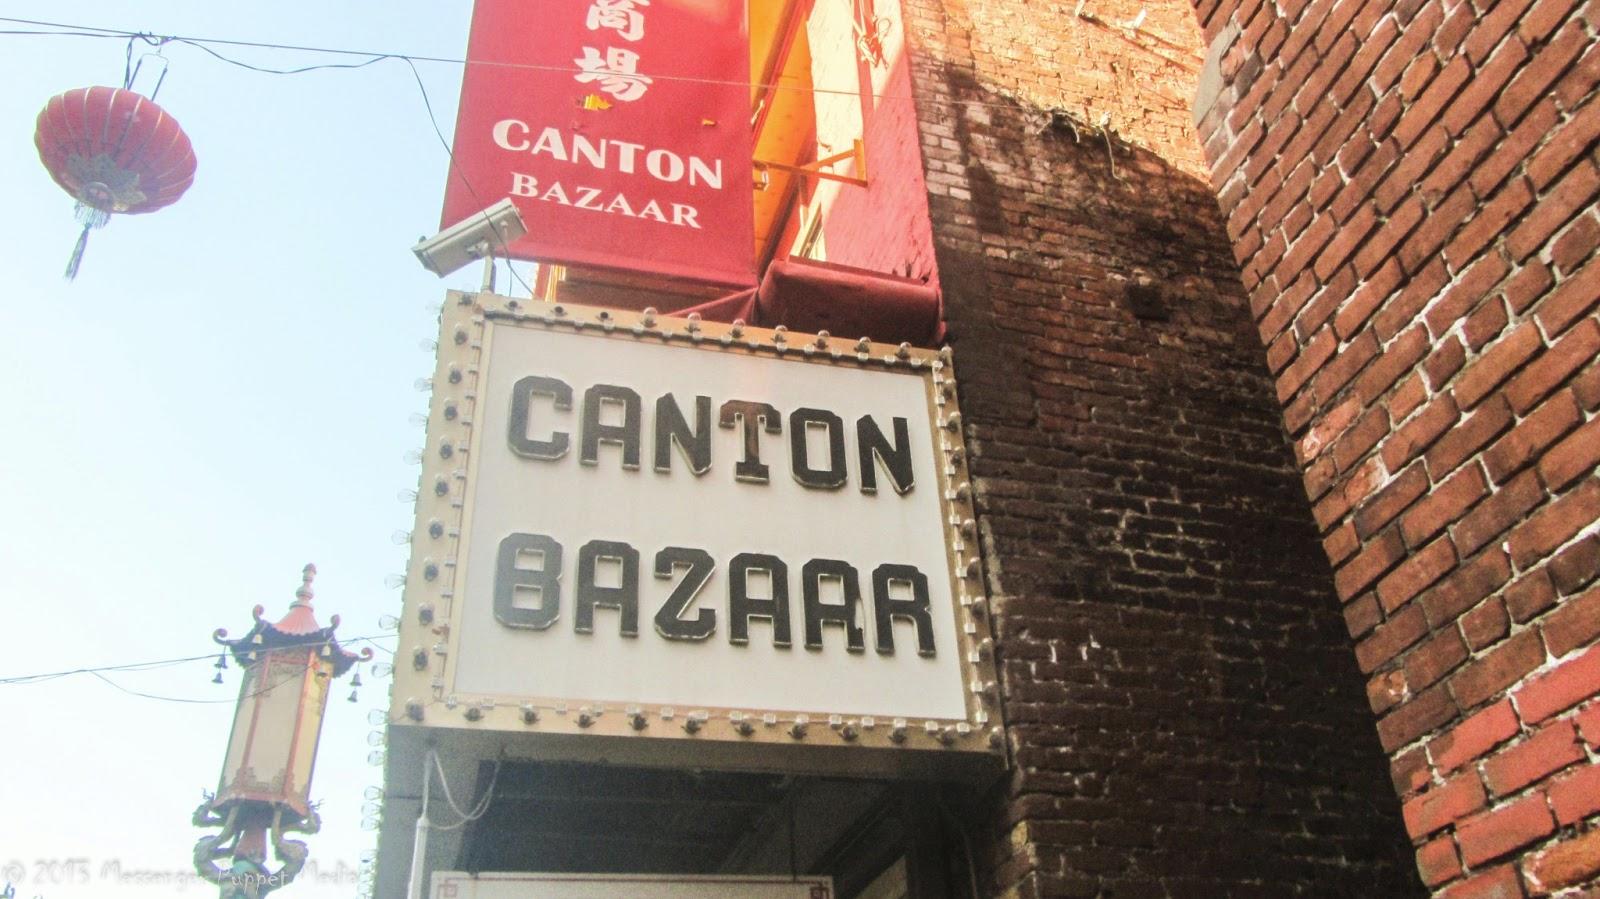 San Francisco Canton Bazaar